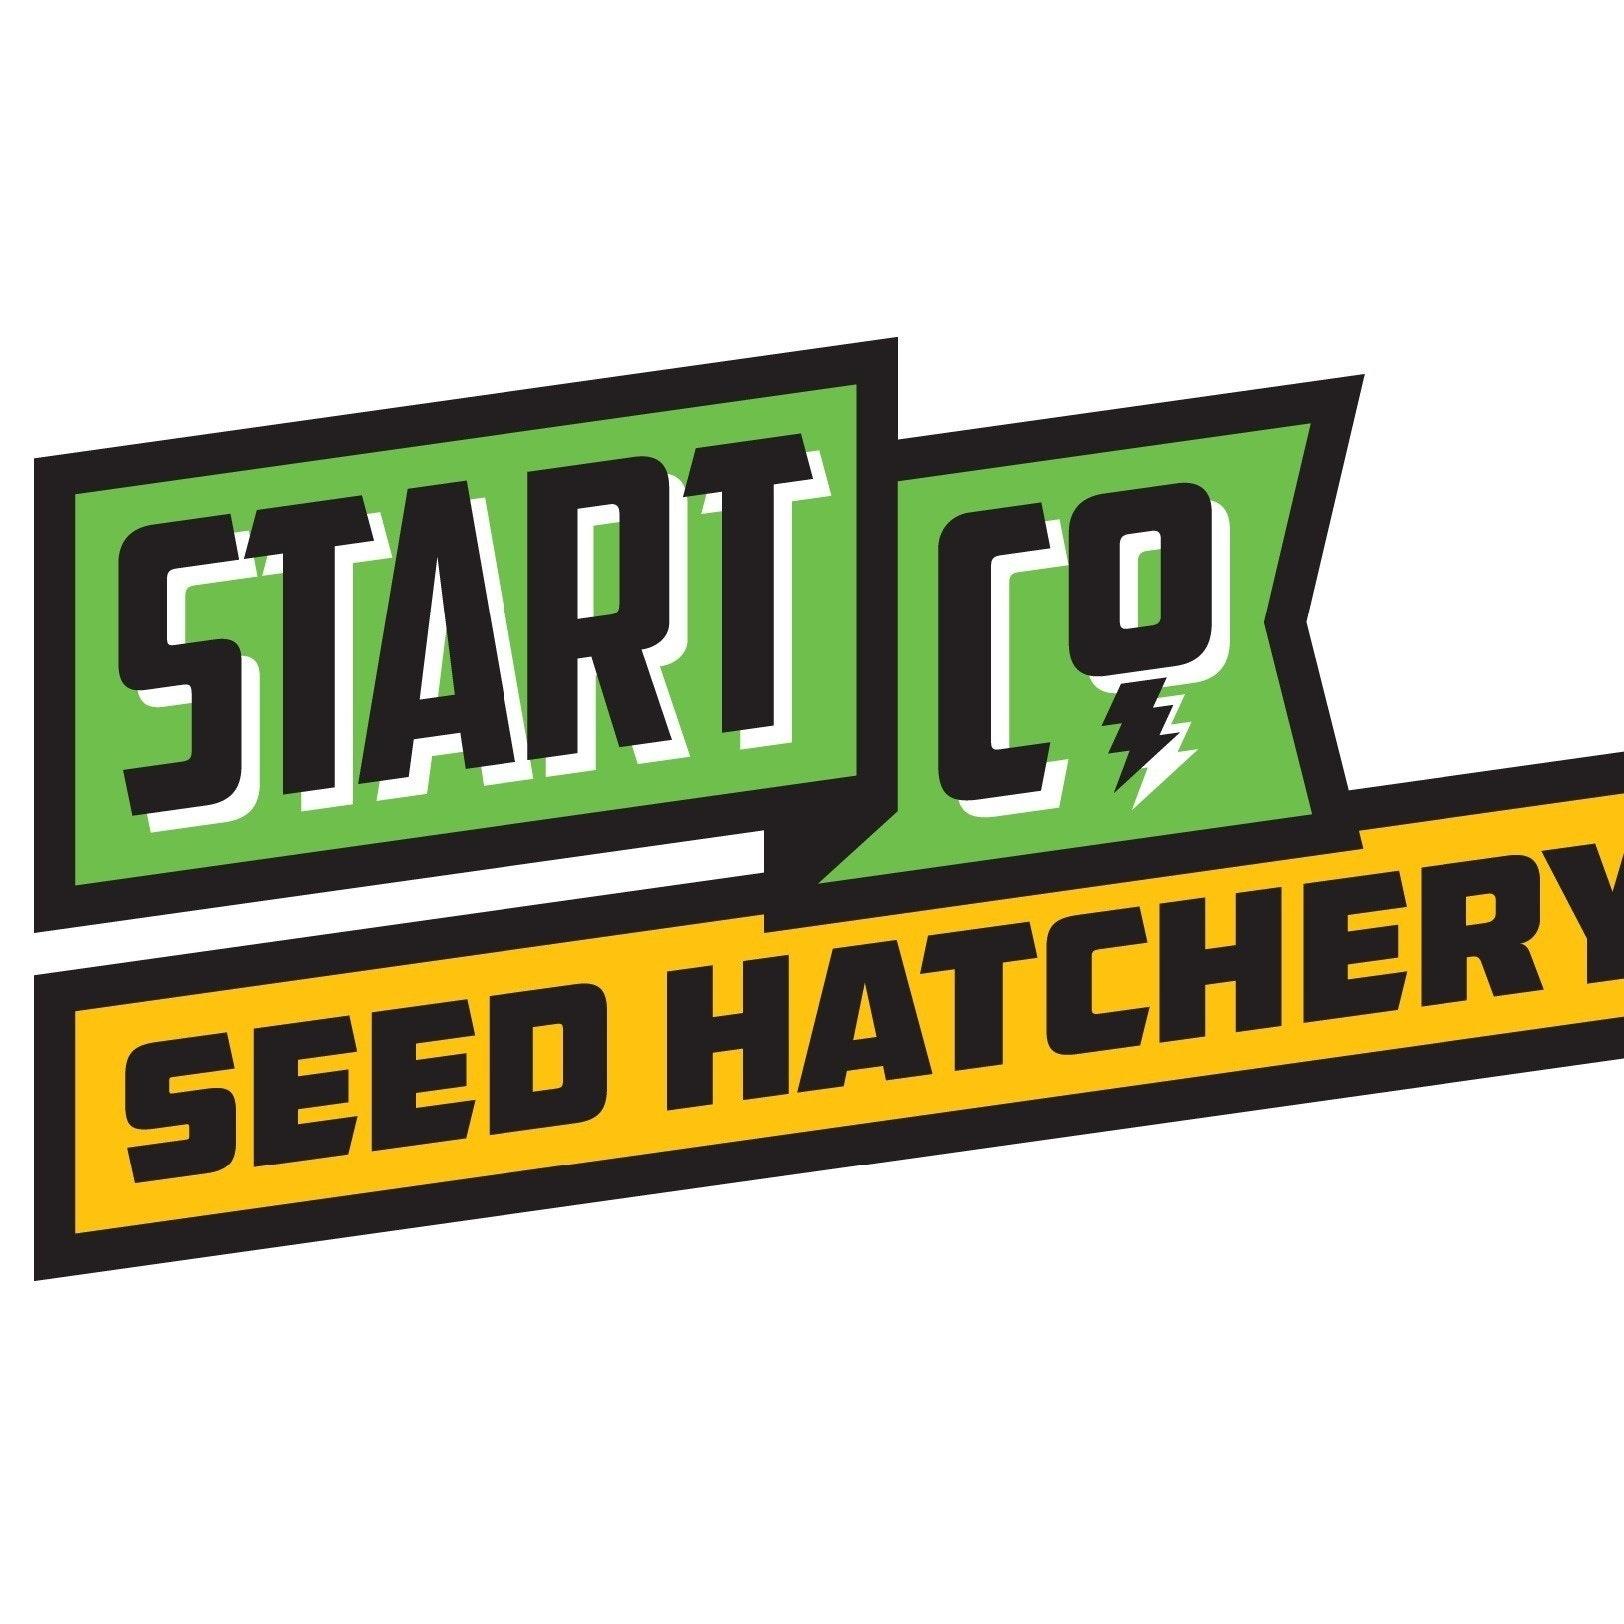 Seed Hatchery